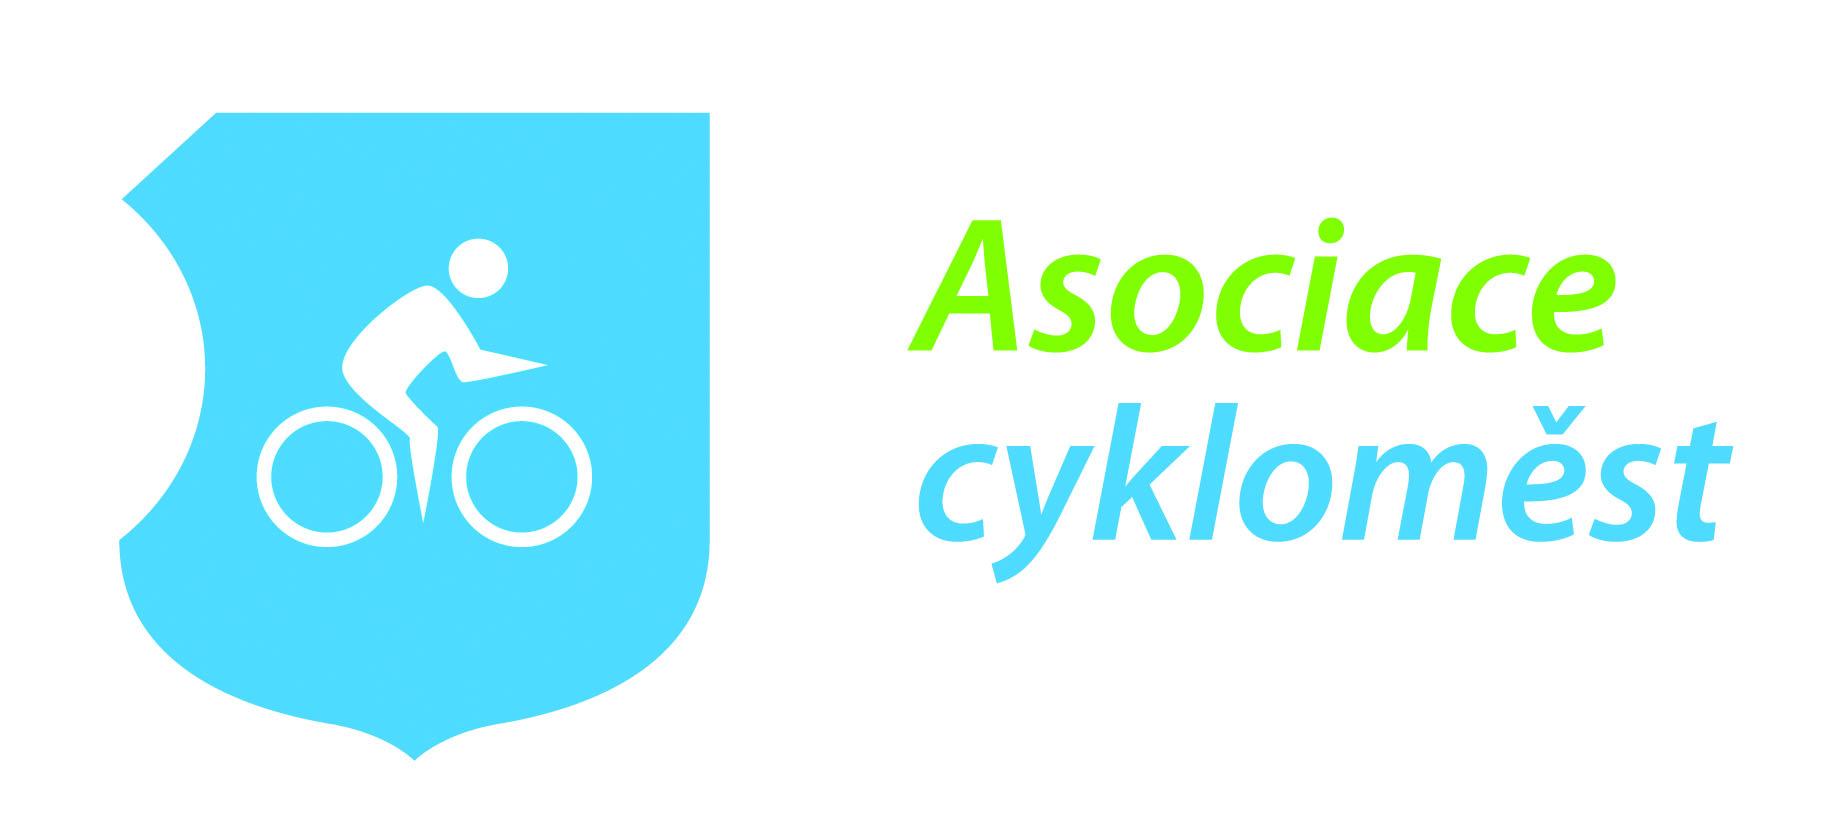 asociace_cyklomest 2.jpg